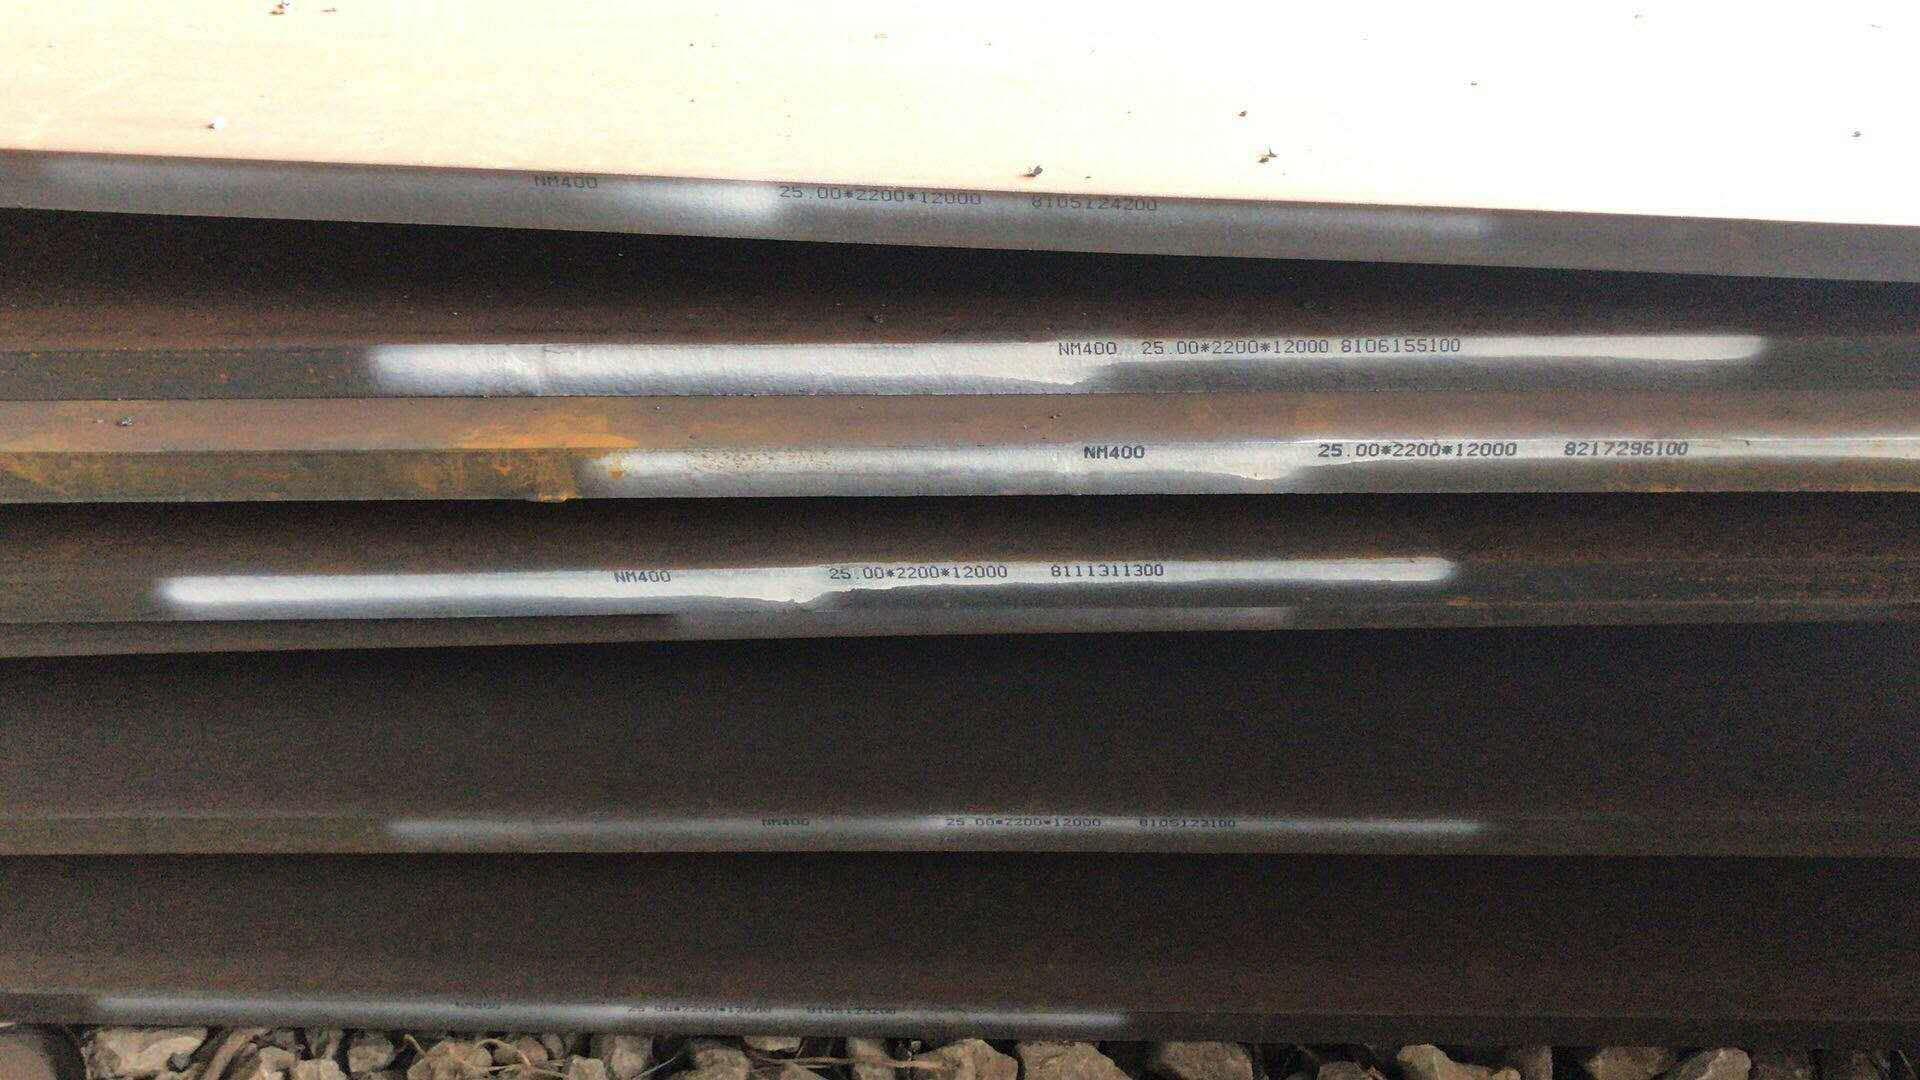 耐候钢,Q295NH耐候钢,耐候钢板,山东Q295NH耐候钢, Q295NH耐候钢板